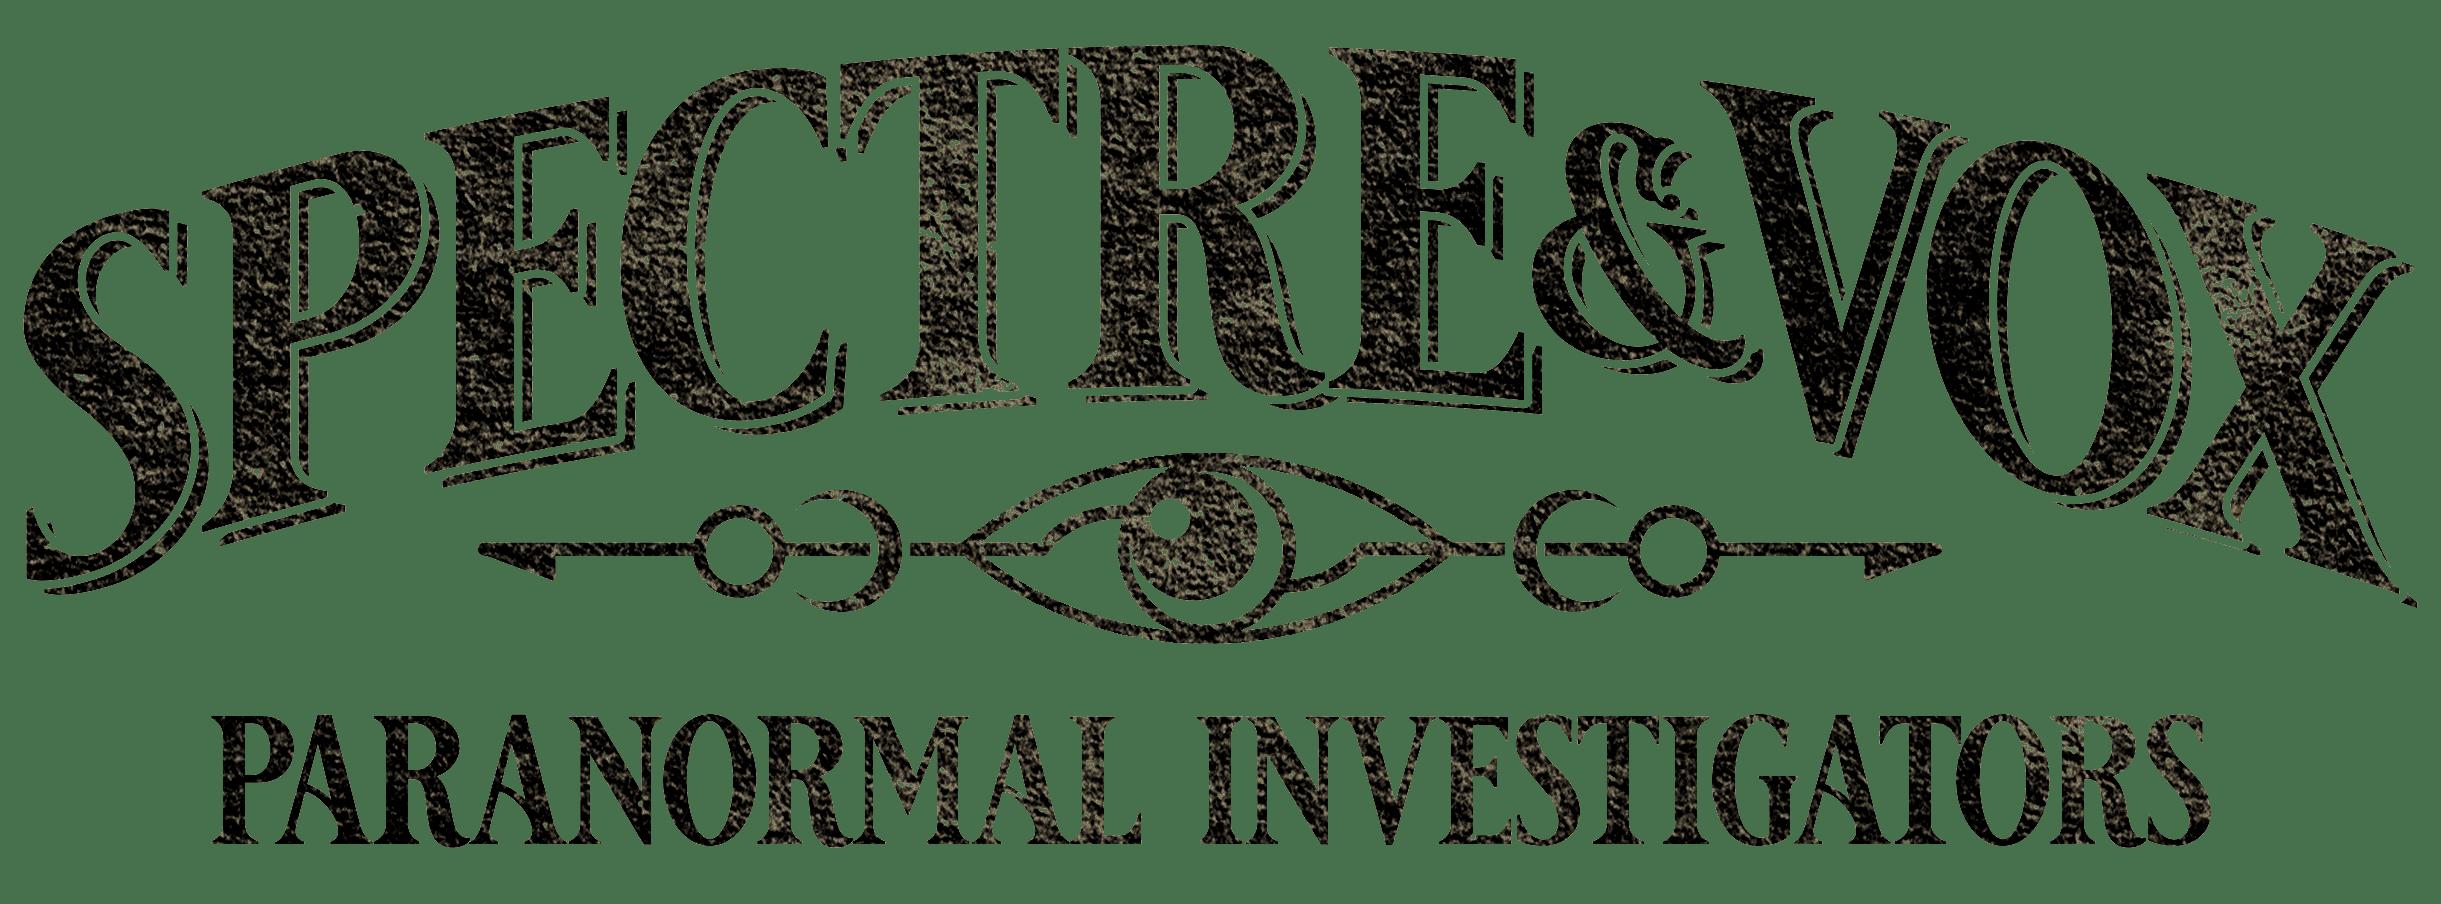 Spectre & Vox logo